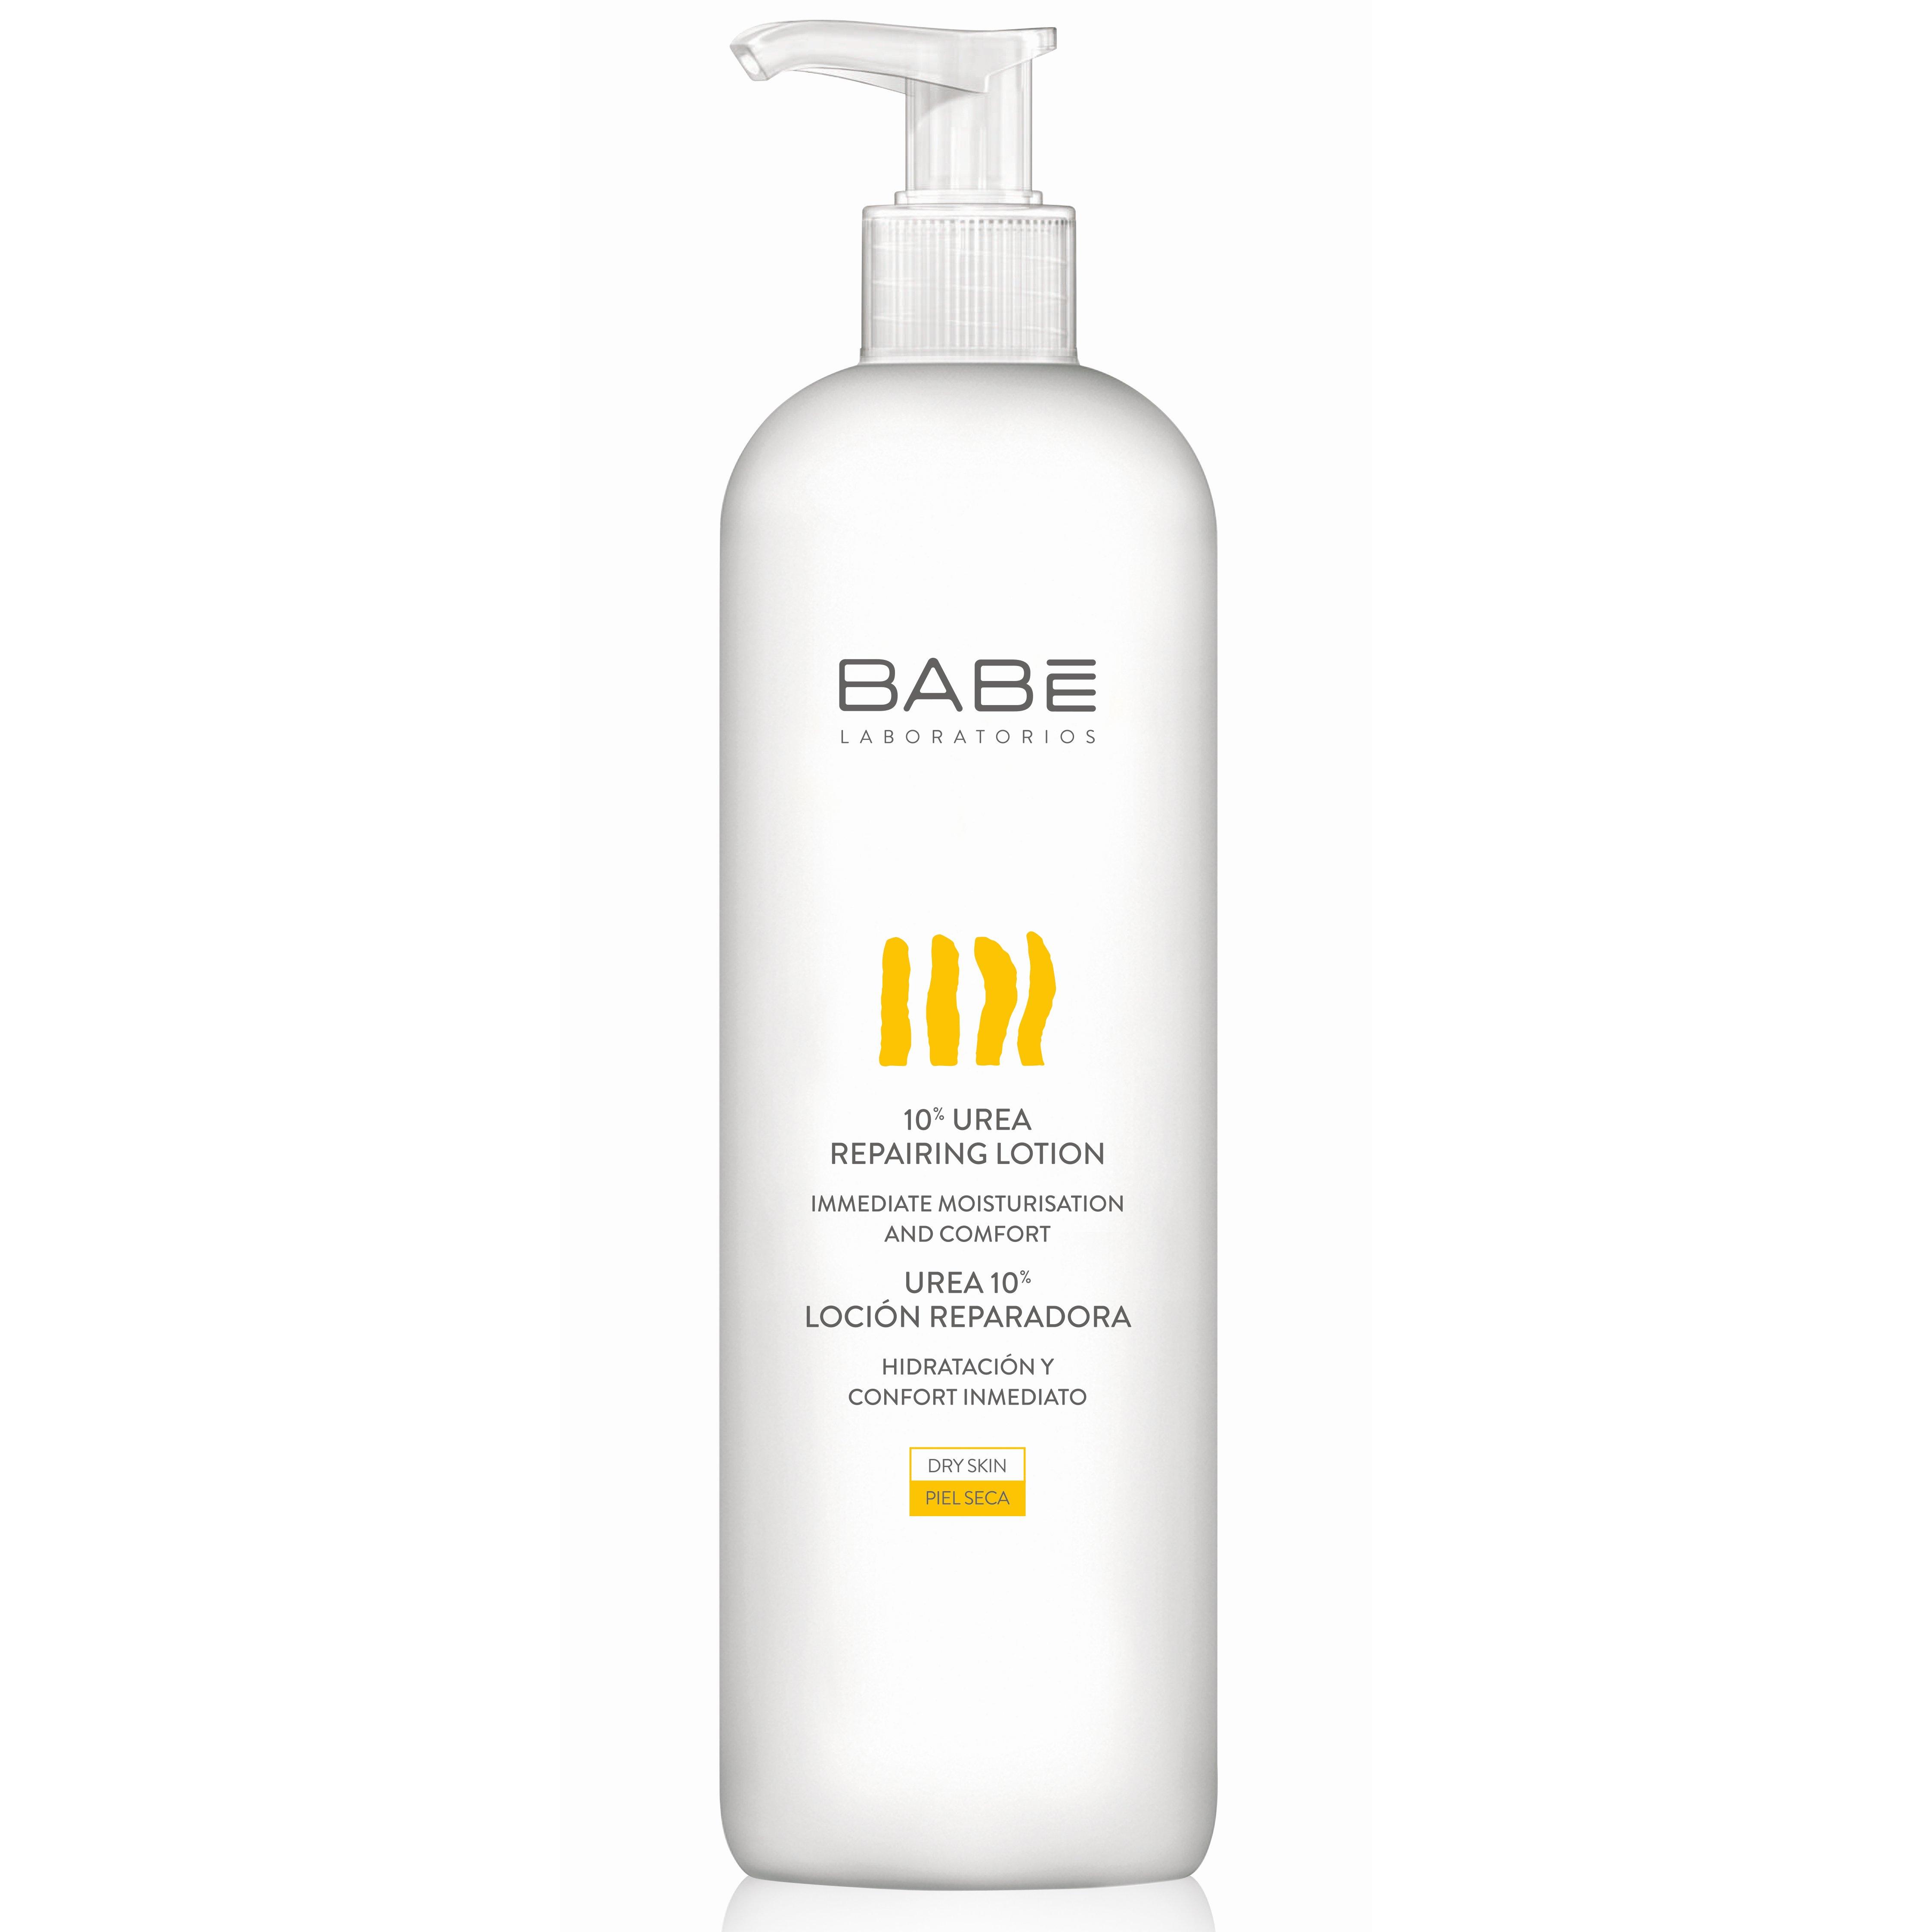 Babe Body 10% Urea Repairing Lotion Επανορθωτικό Γαλάκτωμα Σώματος Εντατικής Ενυδάτωσης για Ξηρή, Πολύ Ξηρή Επιδερμίδα 500ml